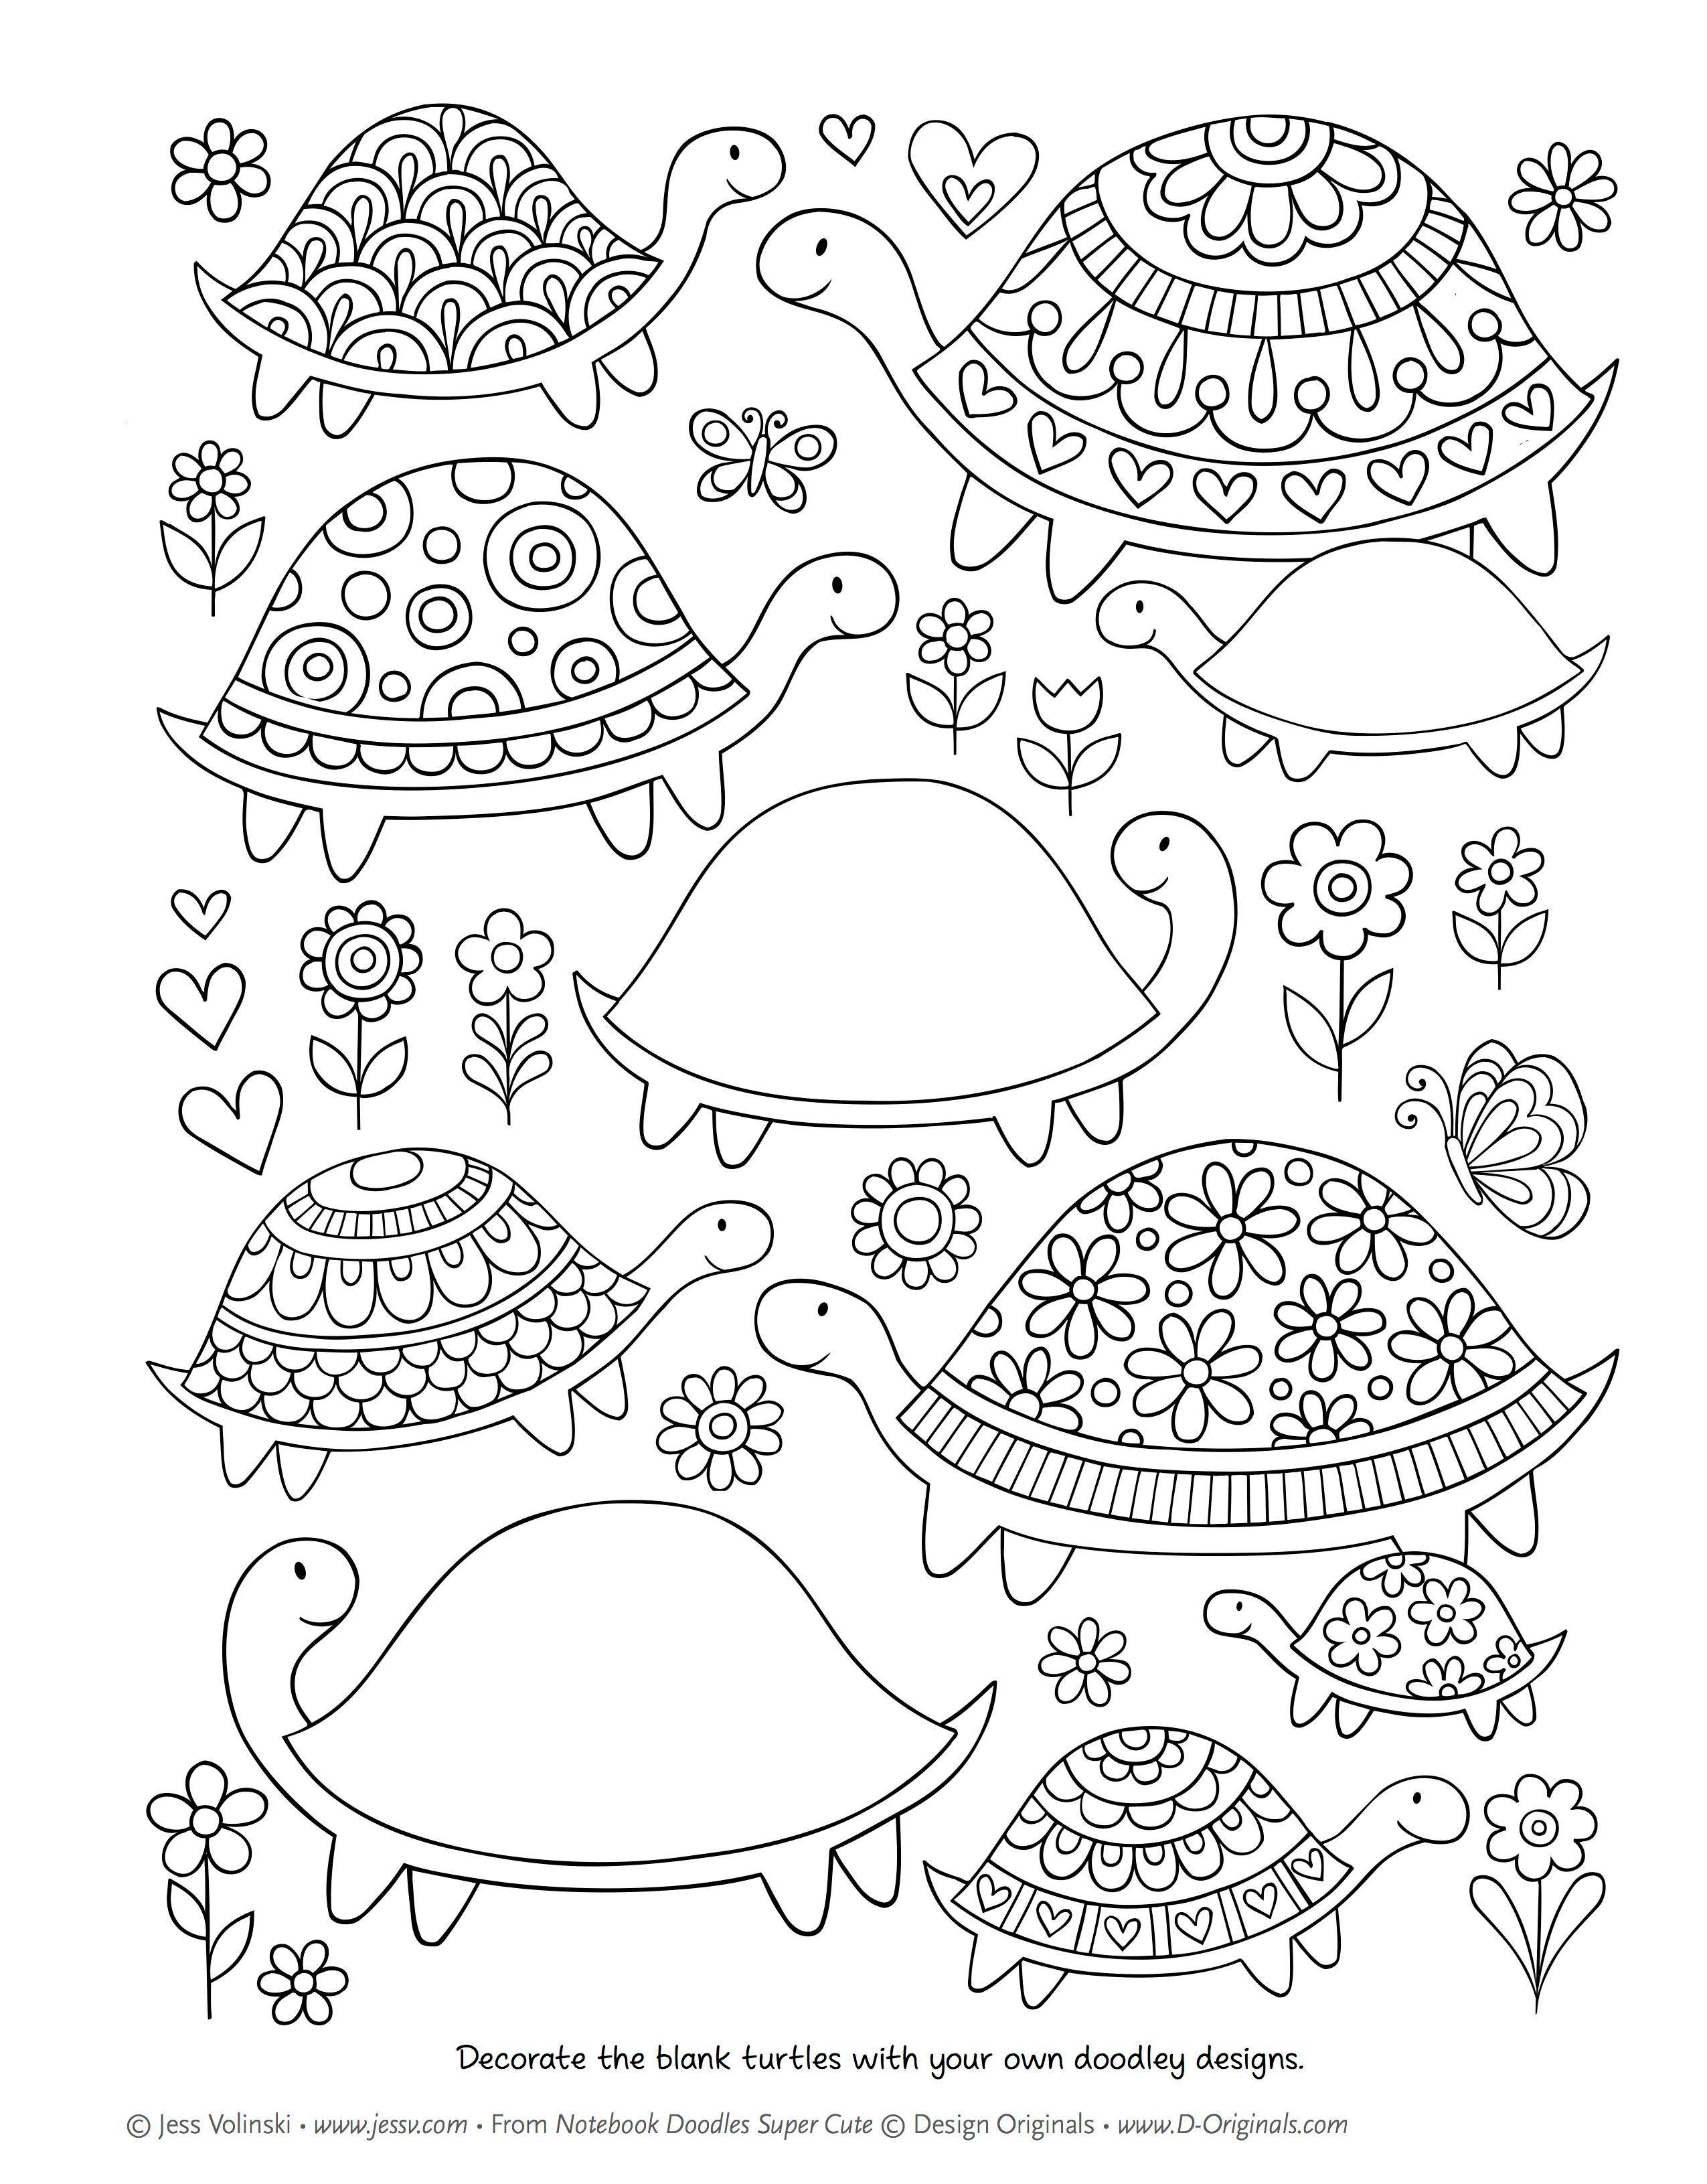 Notebook Doodles Super Cute Coloring Amp Activity Book